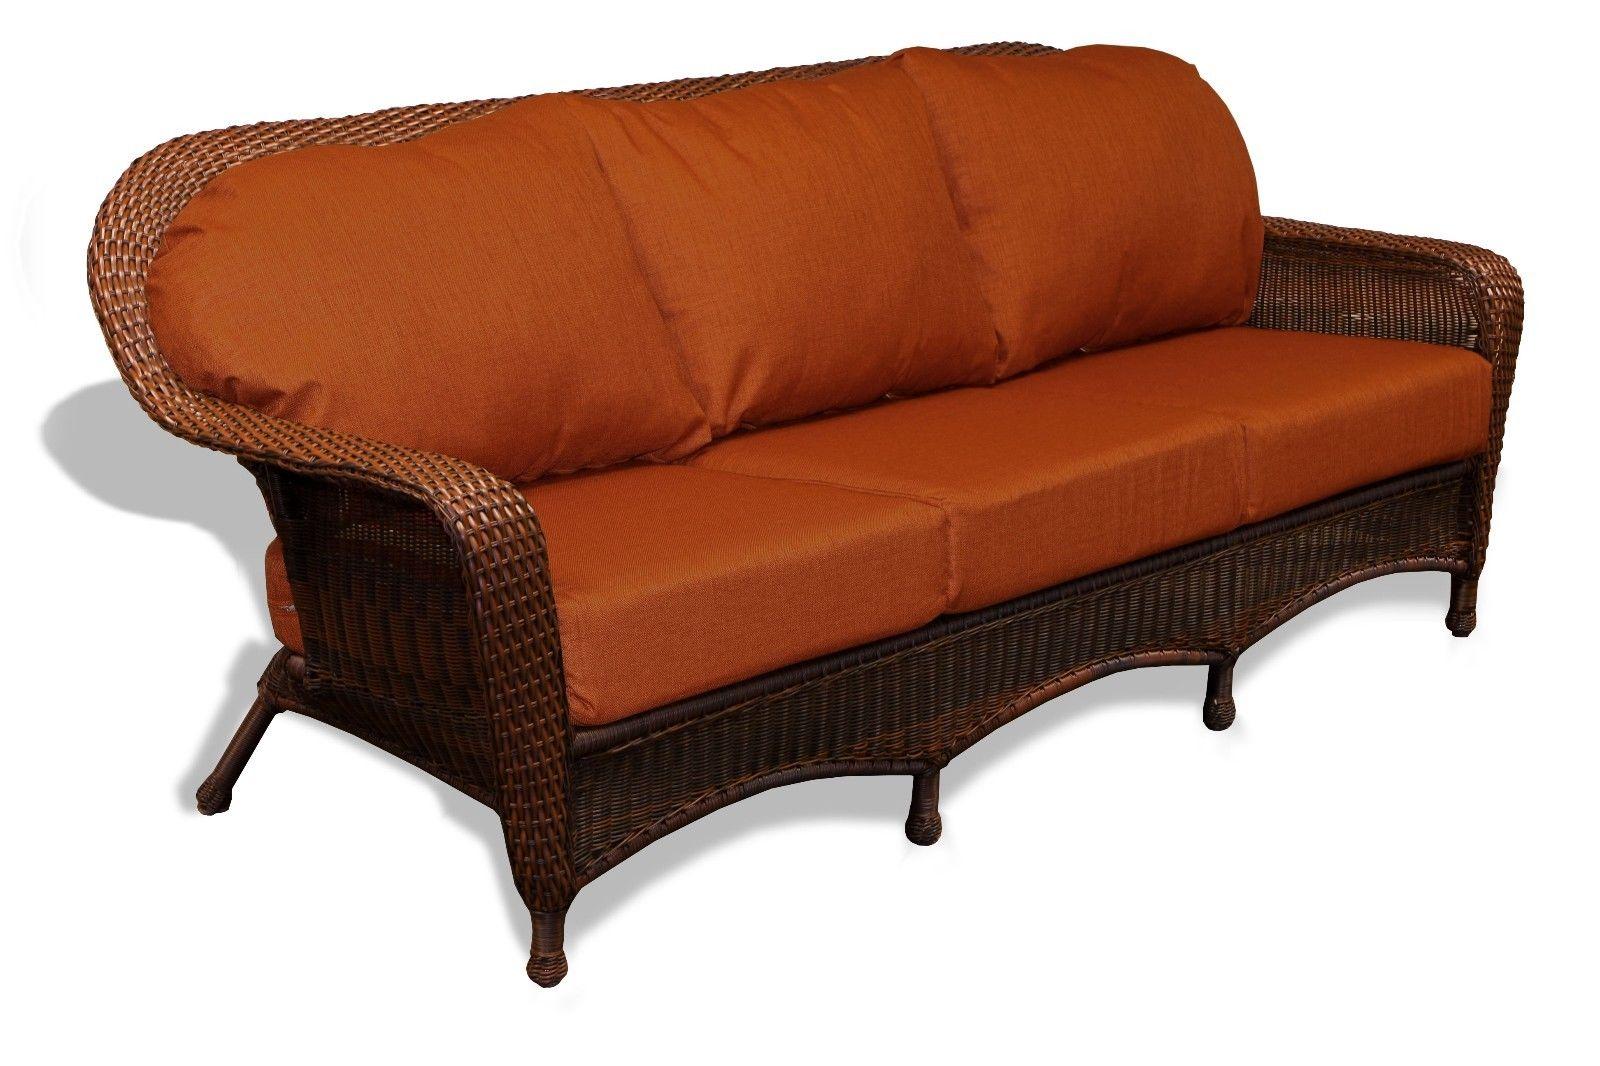 #66 - Outdoor Patio Garden Furniture Java Resin Wicker Sofa - Rave Brick